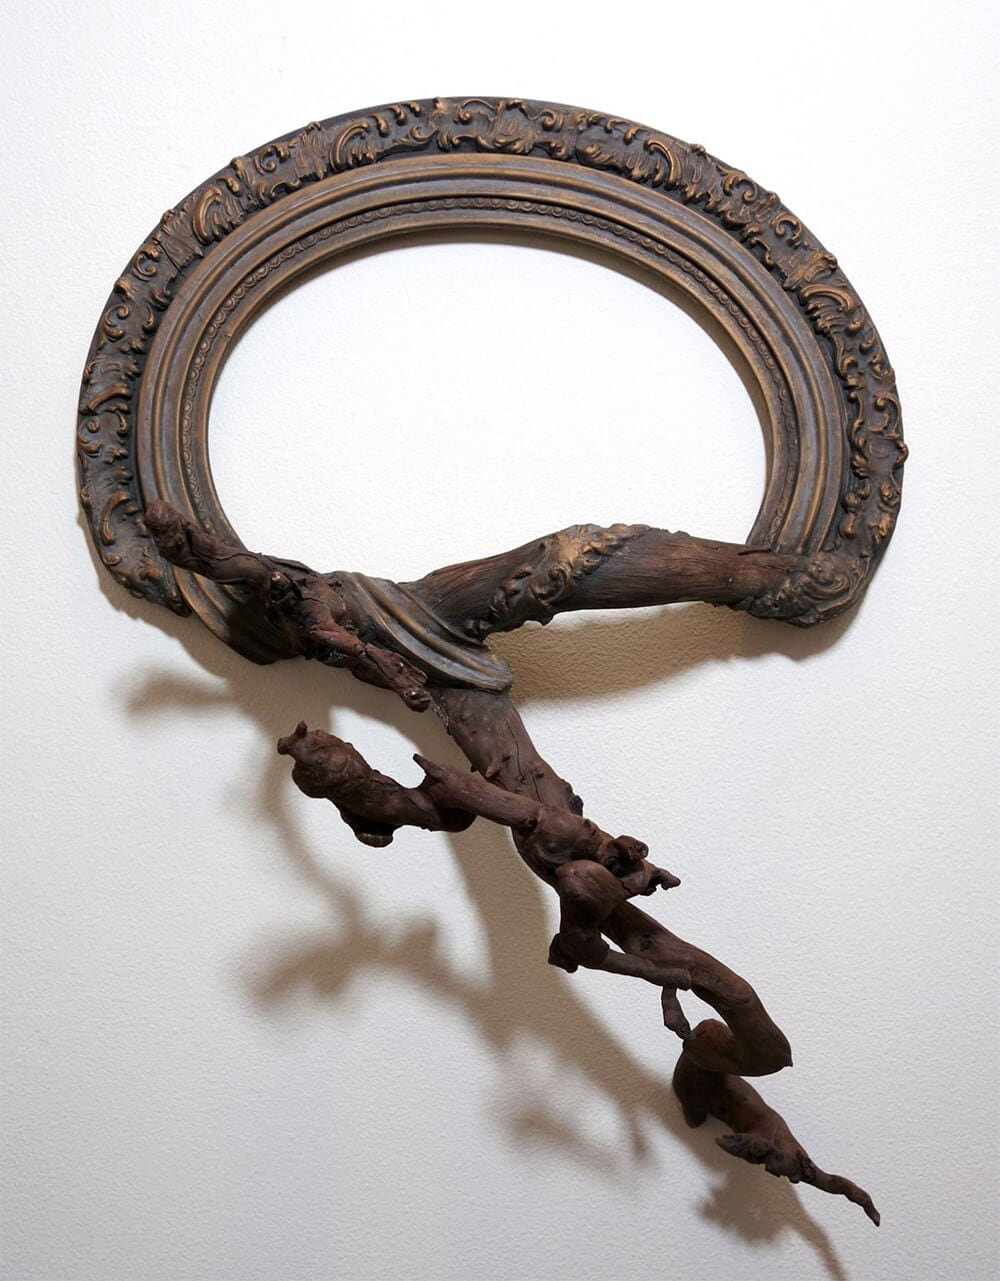 tree-branch-frames-darryl-cox-freeyork-9